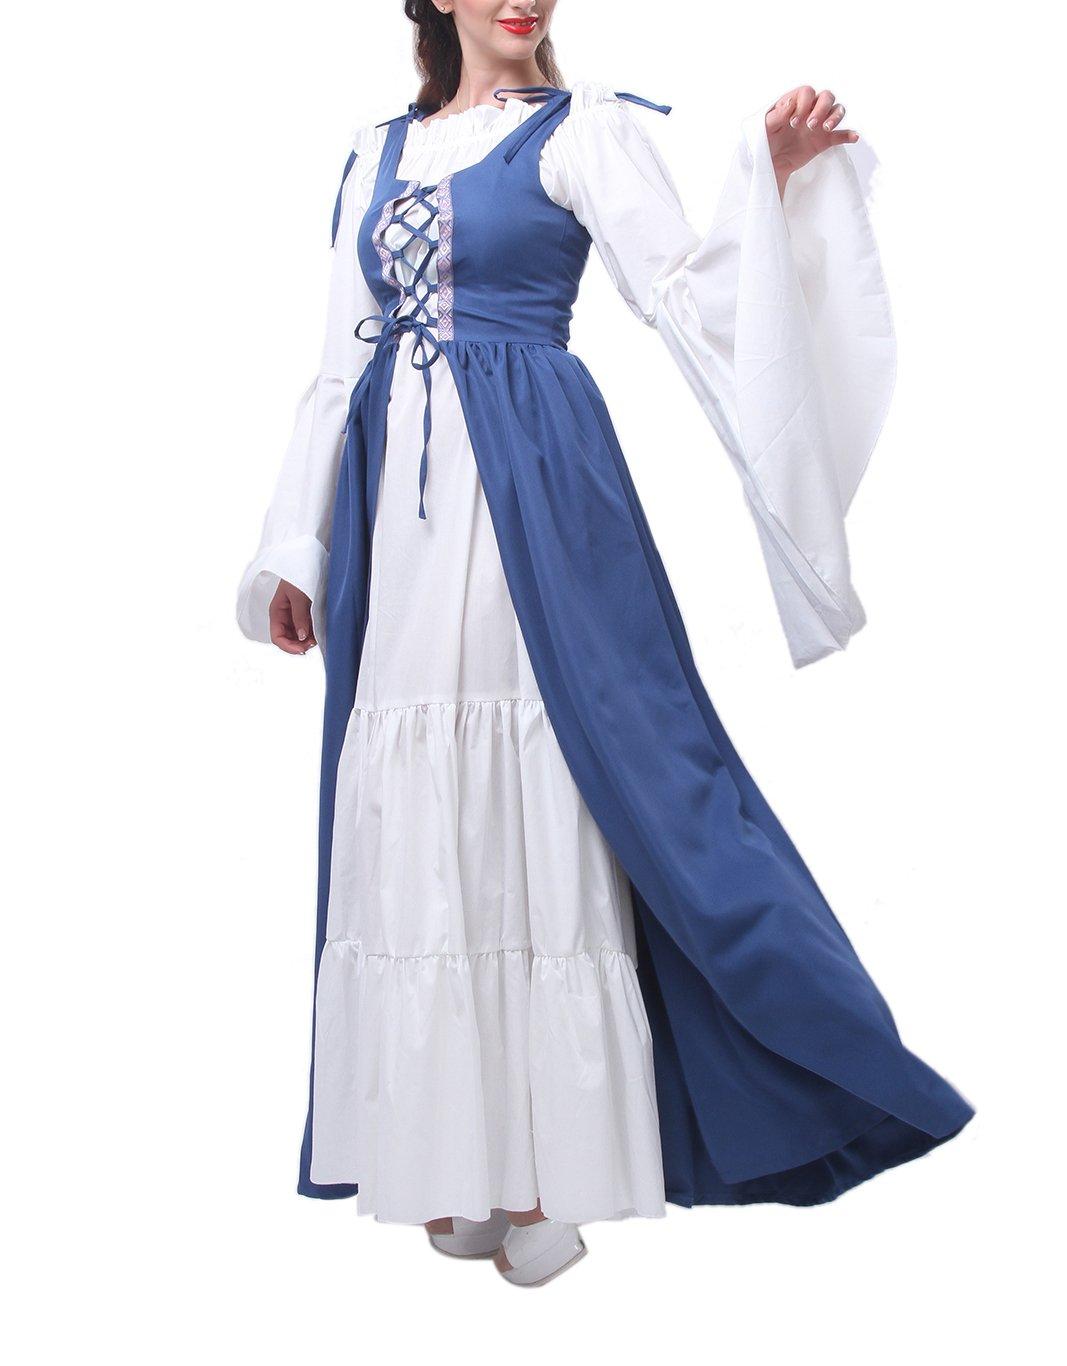 ROLECOS Womens Renaissance Medieval Irish Costume Boho Underdress Overdress Coat Light Blue L by ROLECOS (Image #1)